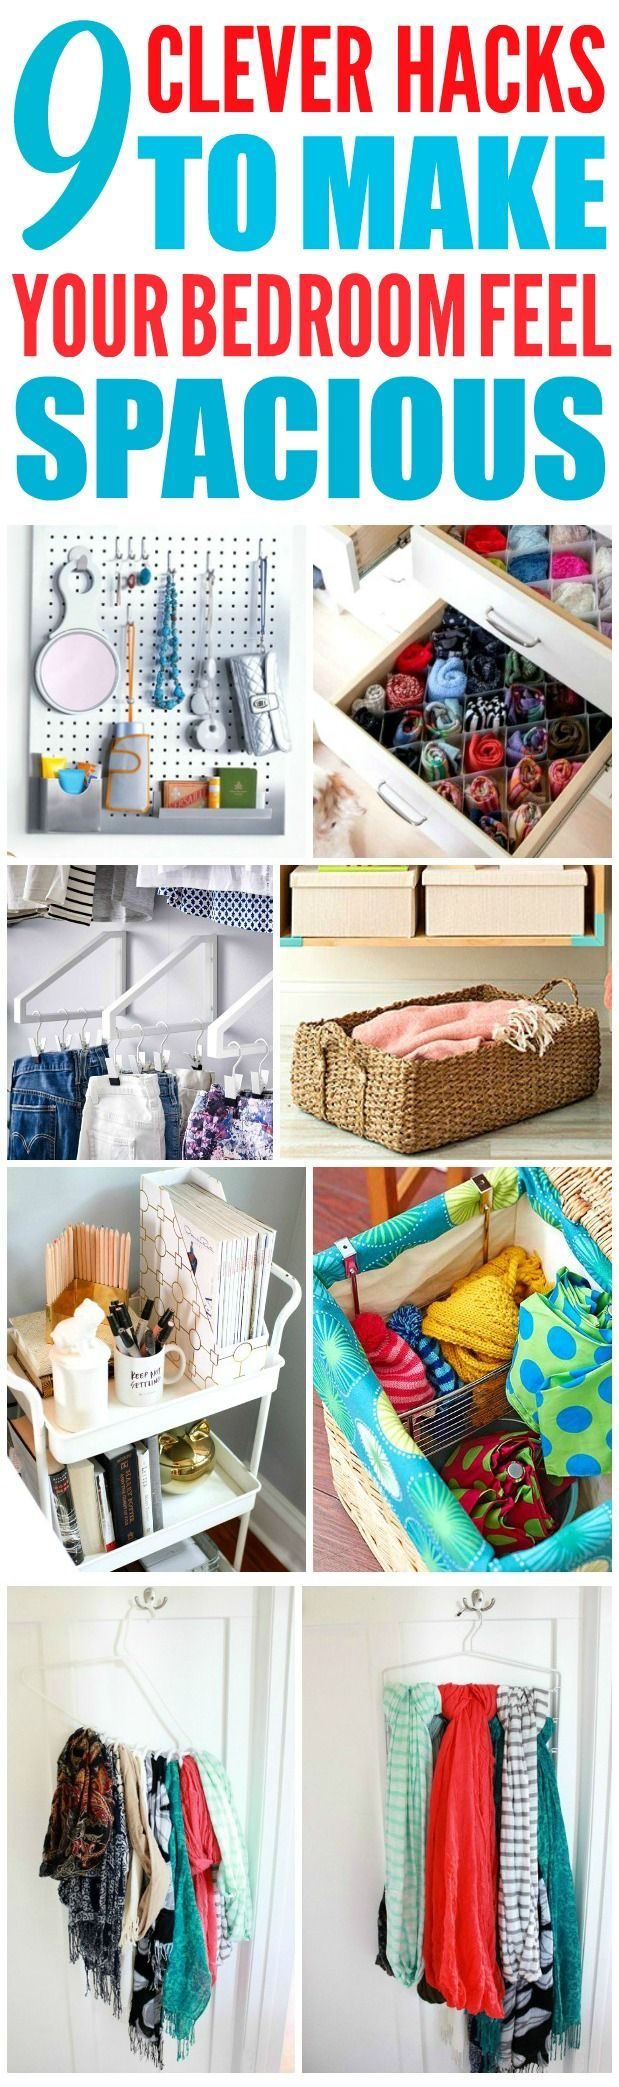 26 best Summer Home Maintenance images on Pinterest | Garage ideas ...